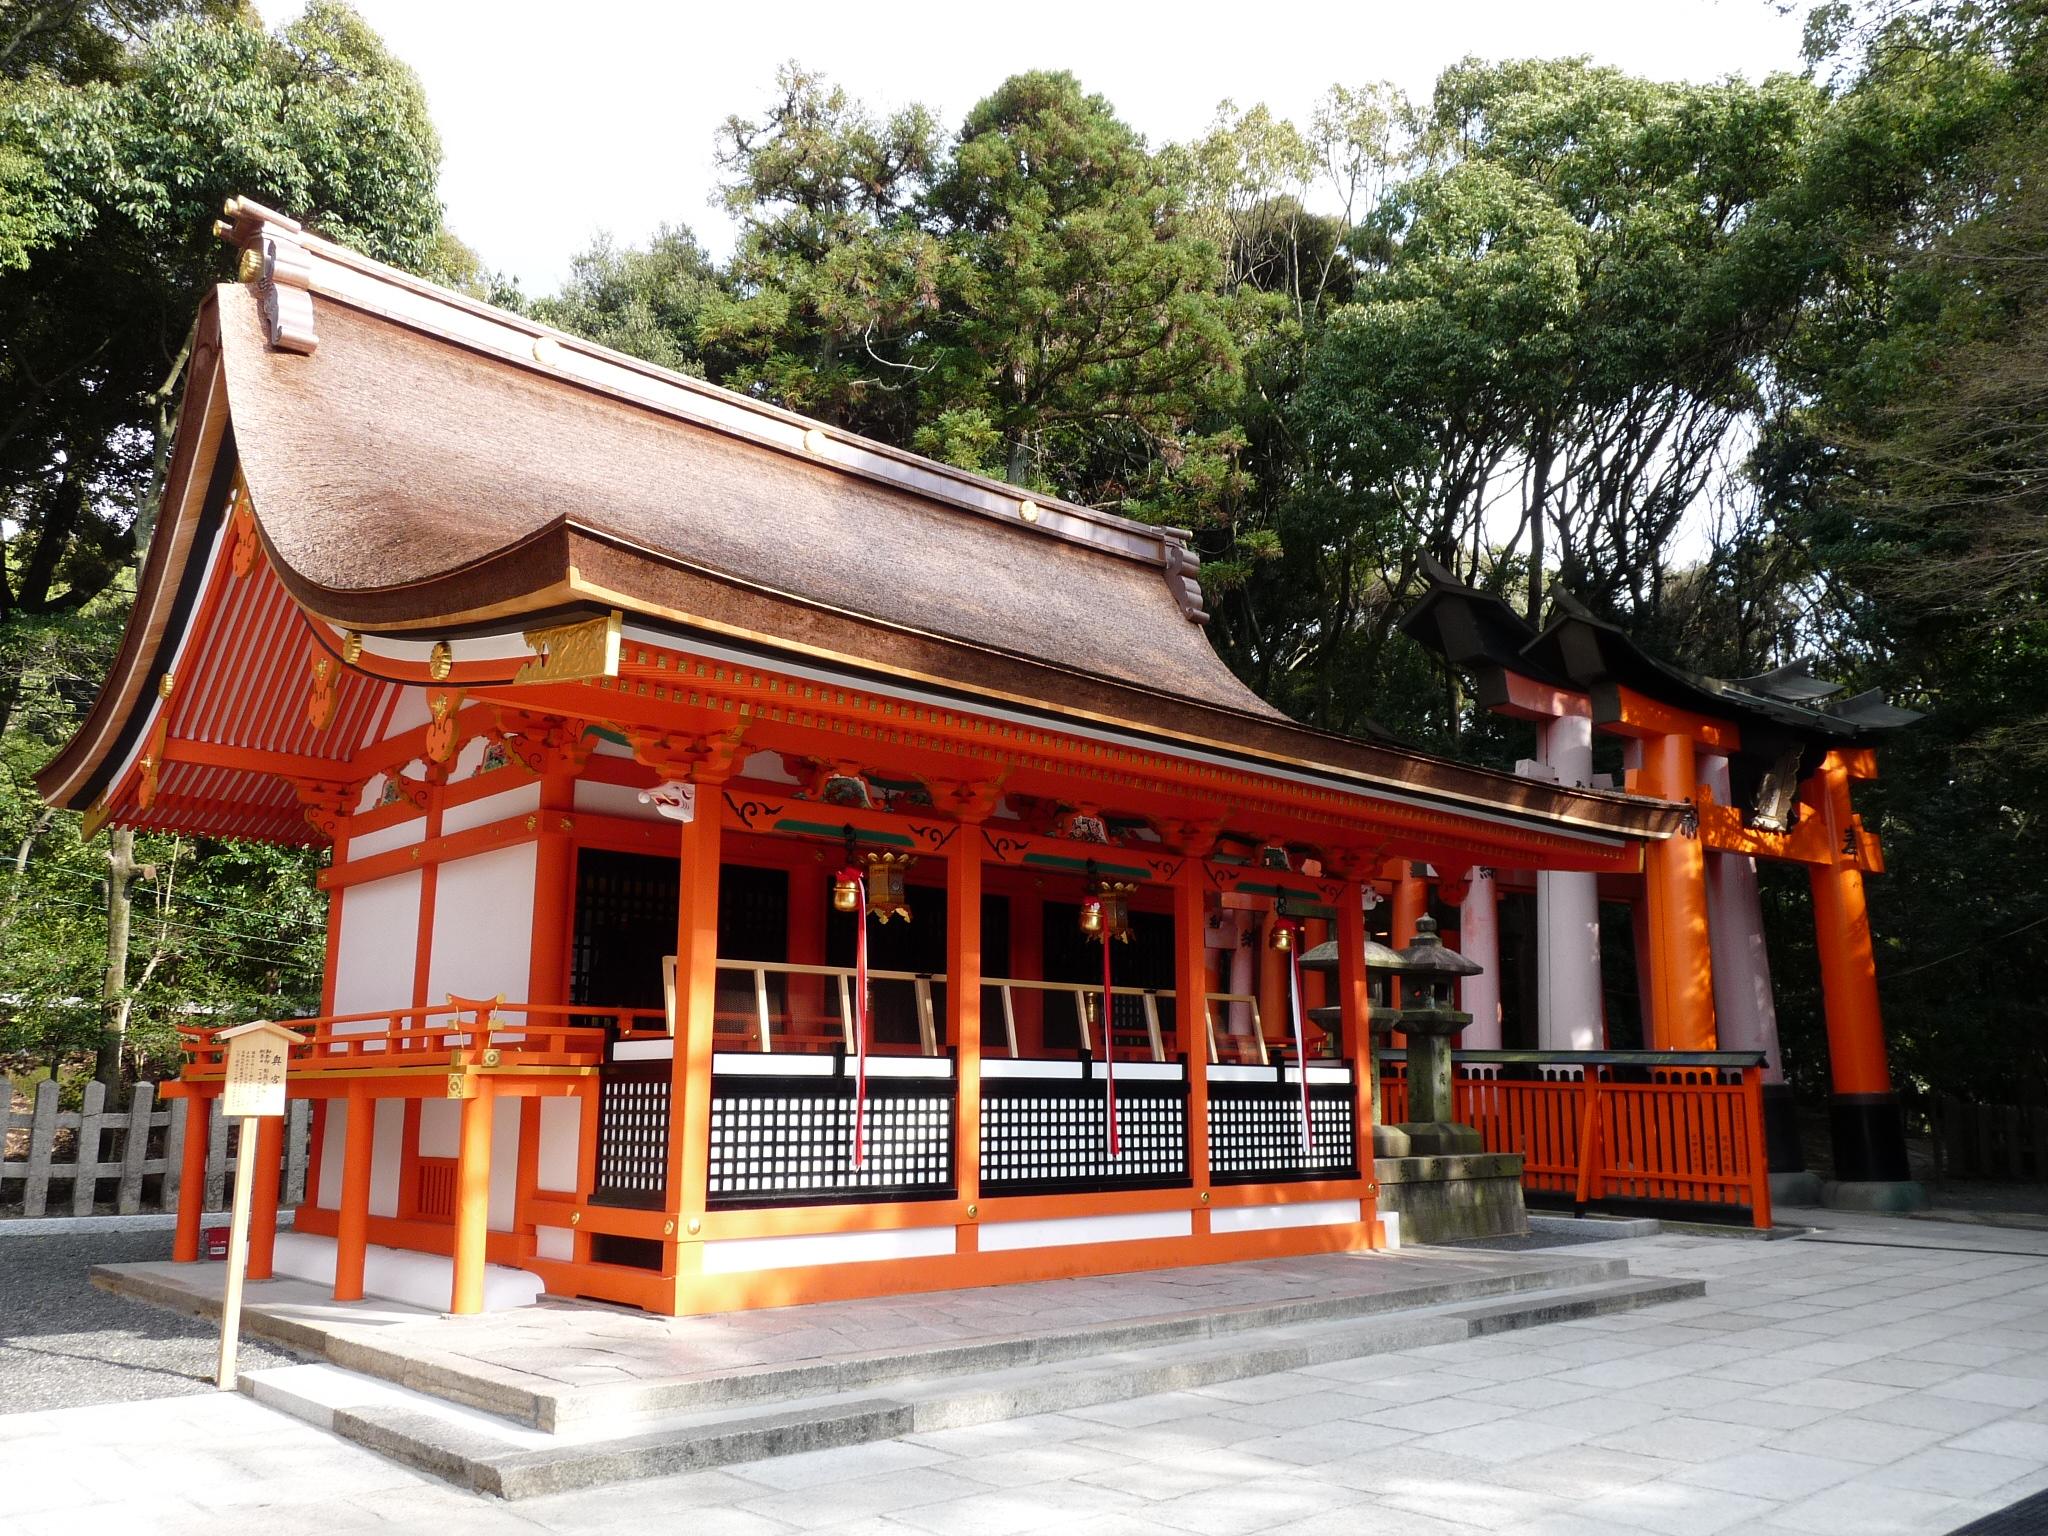 Fushimi Inari Taisha (伏見稲荷大社), Kyoto (京都)